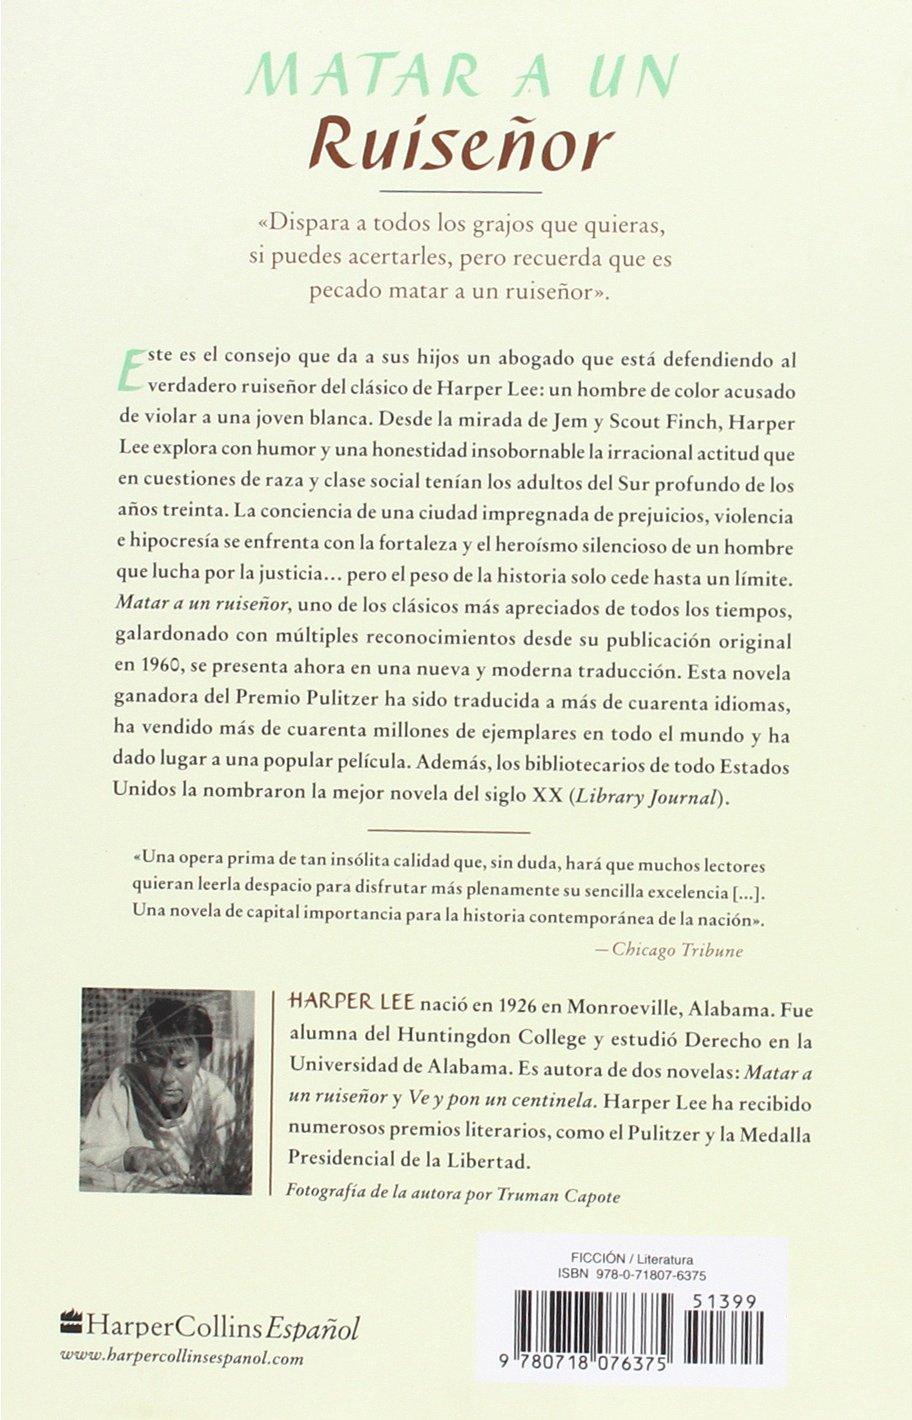 Matar a un ruiseñor (To Kill a Mockingbird - Spanish Edition): Harper Lee: 9780718076375: Amazon.com: Books